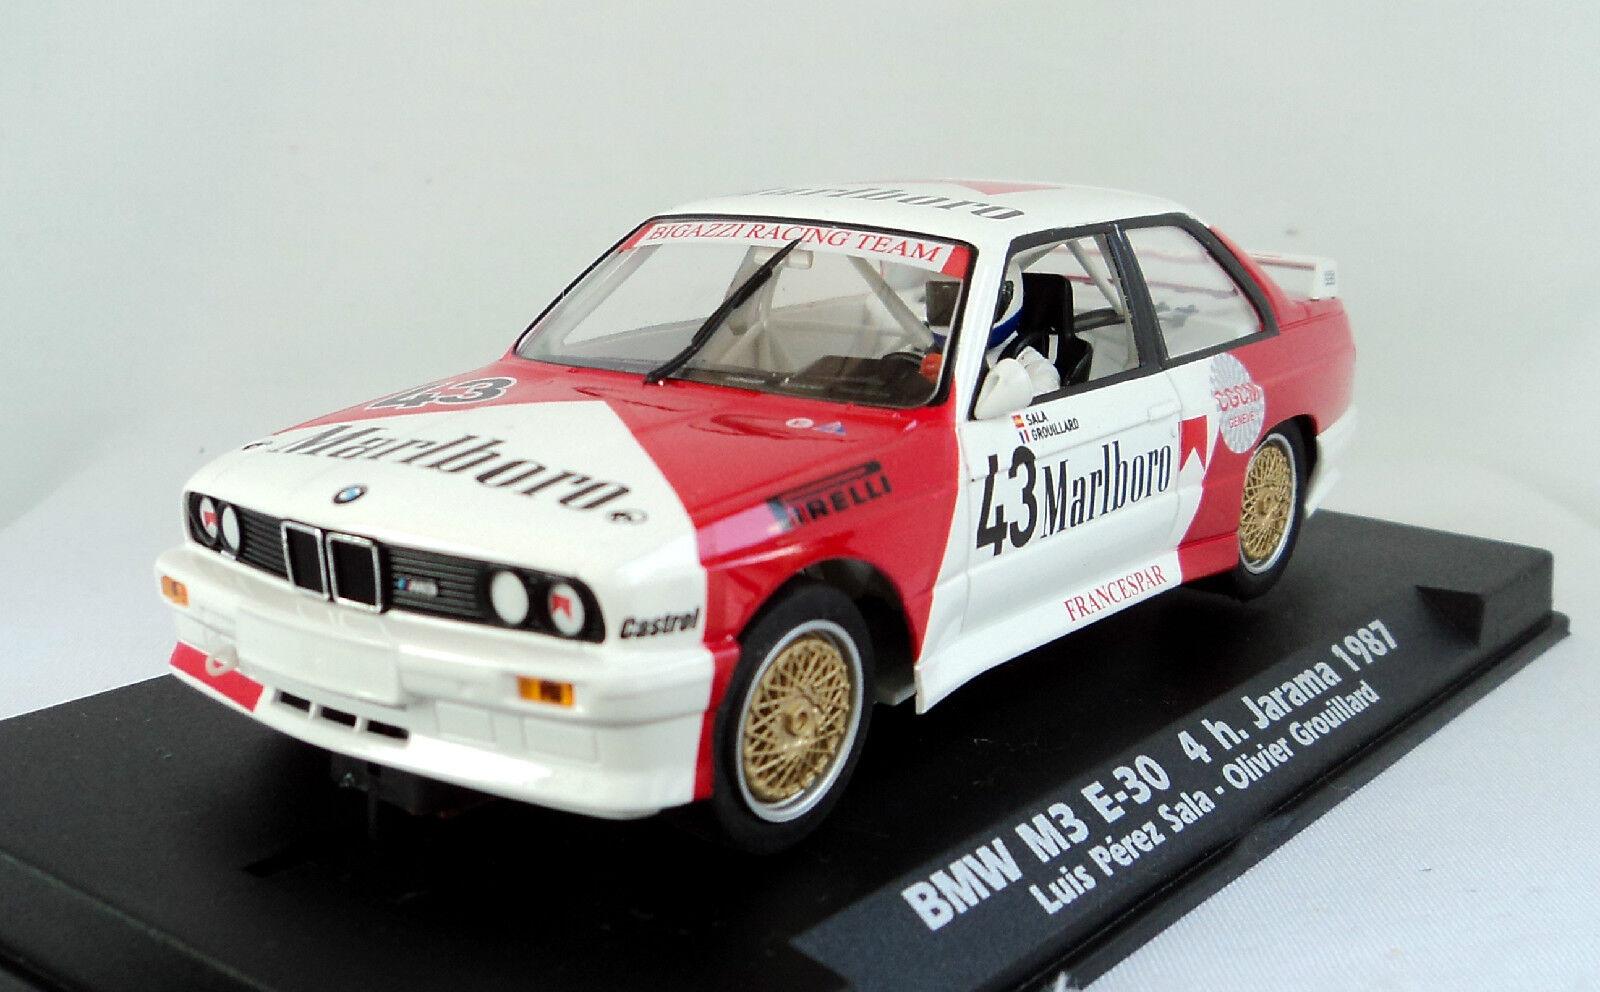 FLY 038103 BMW M3 E30 Marlbgold h. Jarama 1987 Brand New 1 32 Slot Car